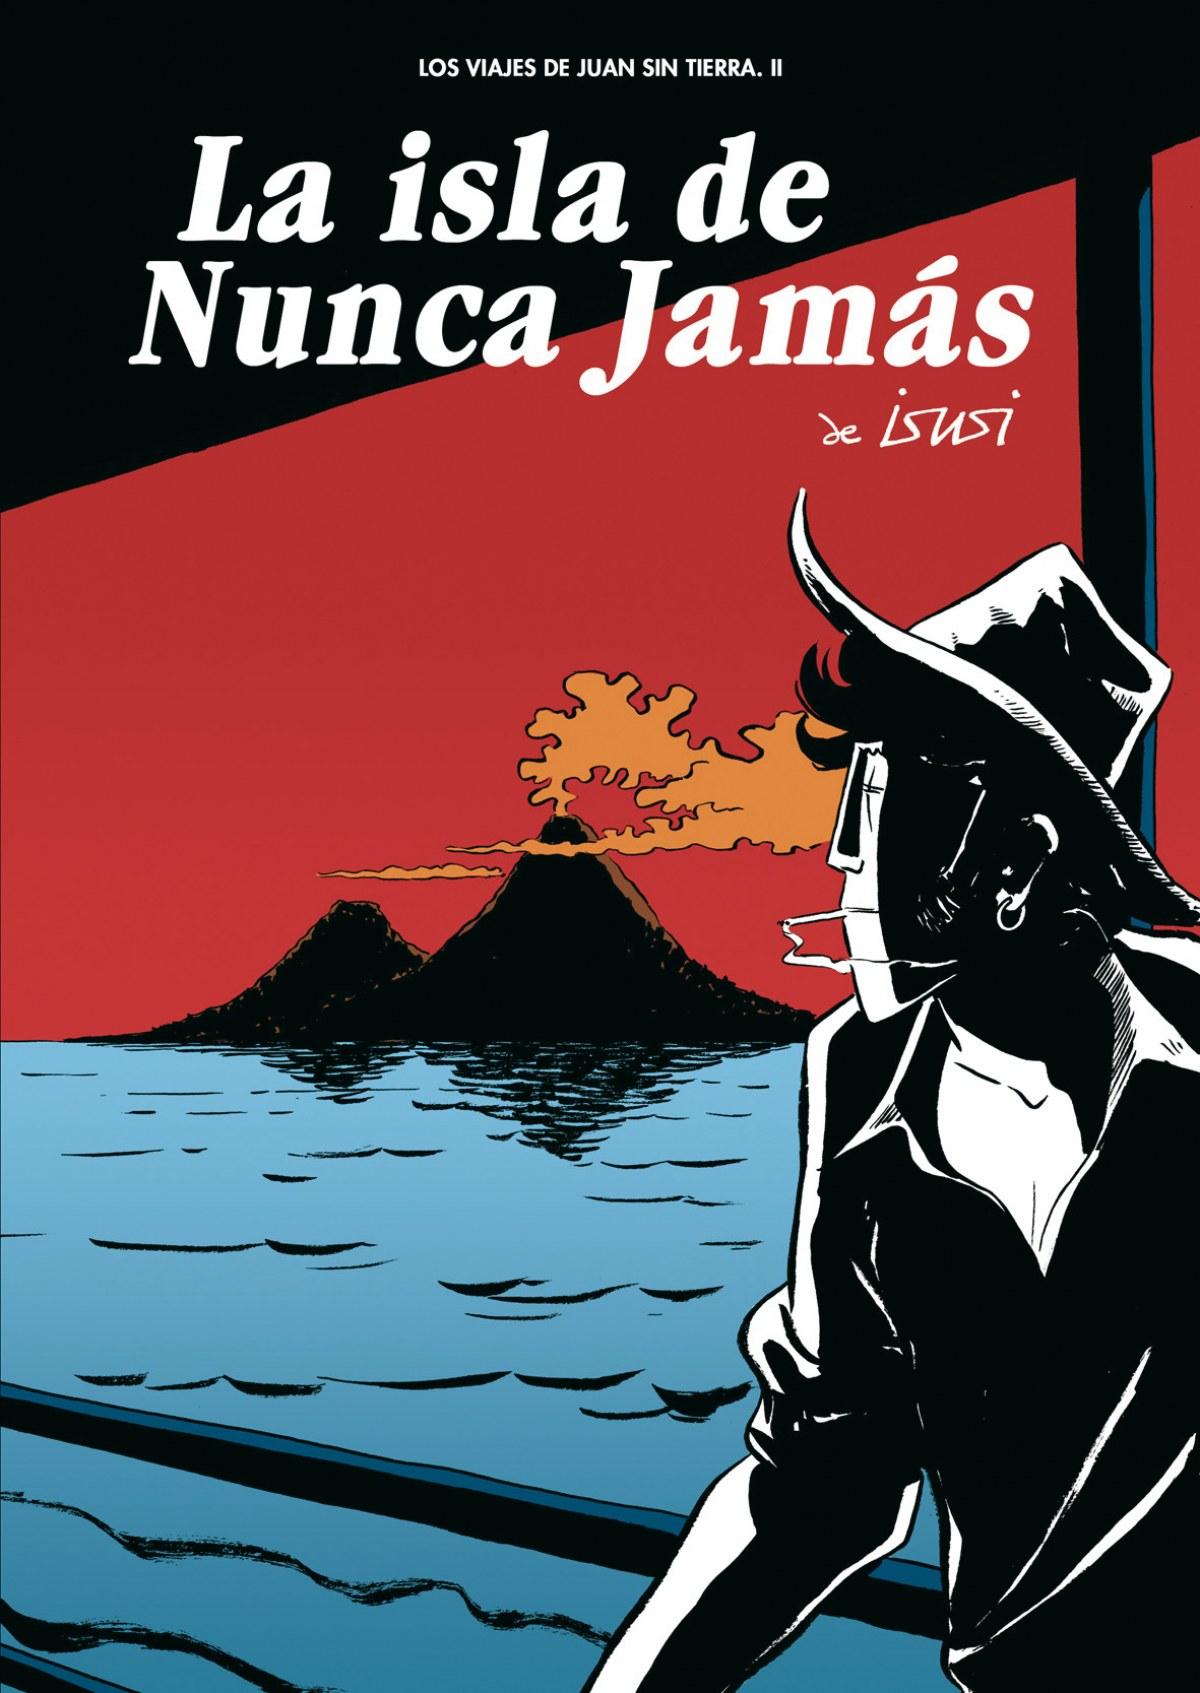 La isla de Nunca Jamás - Isusi Javier De